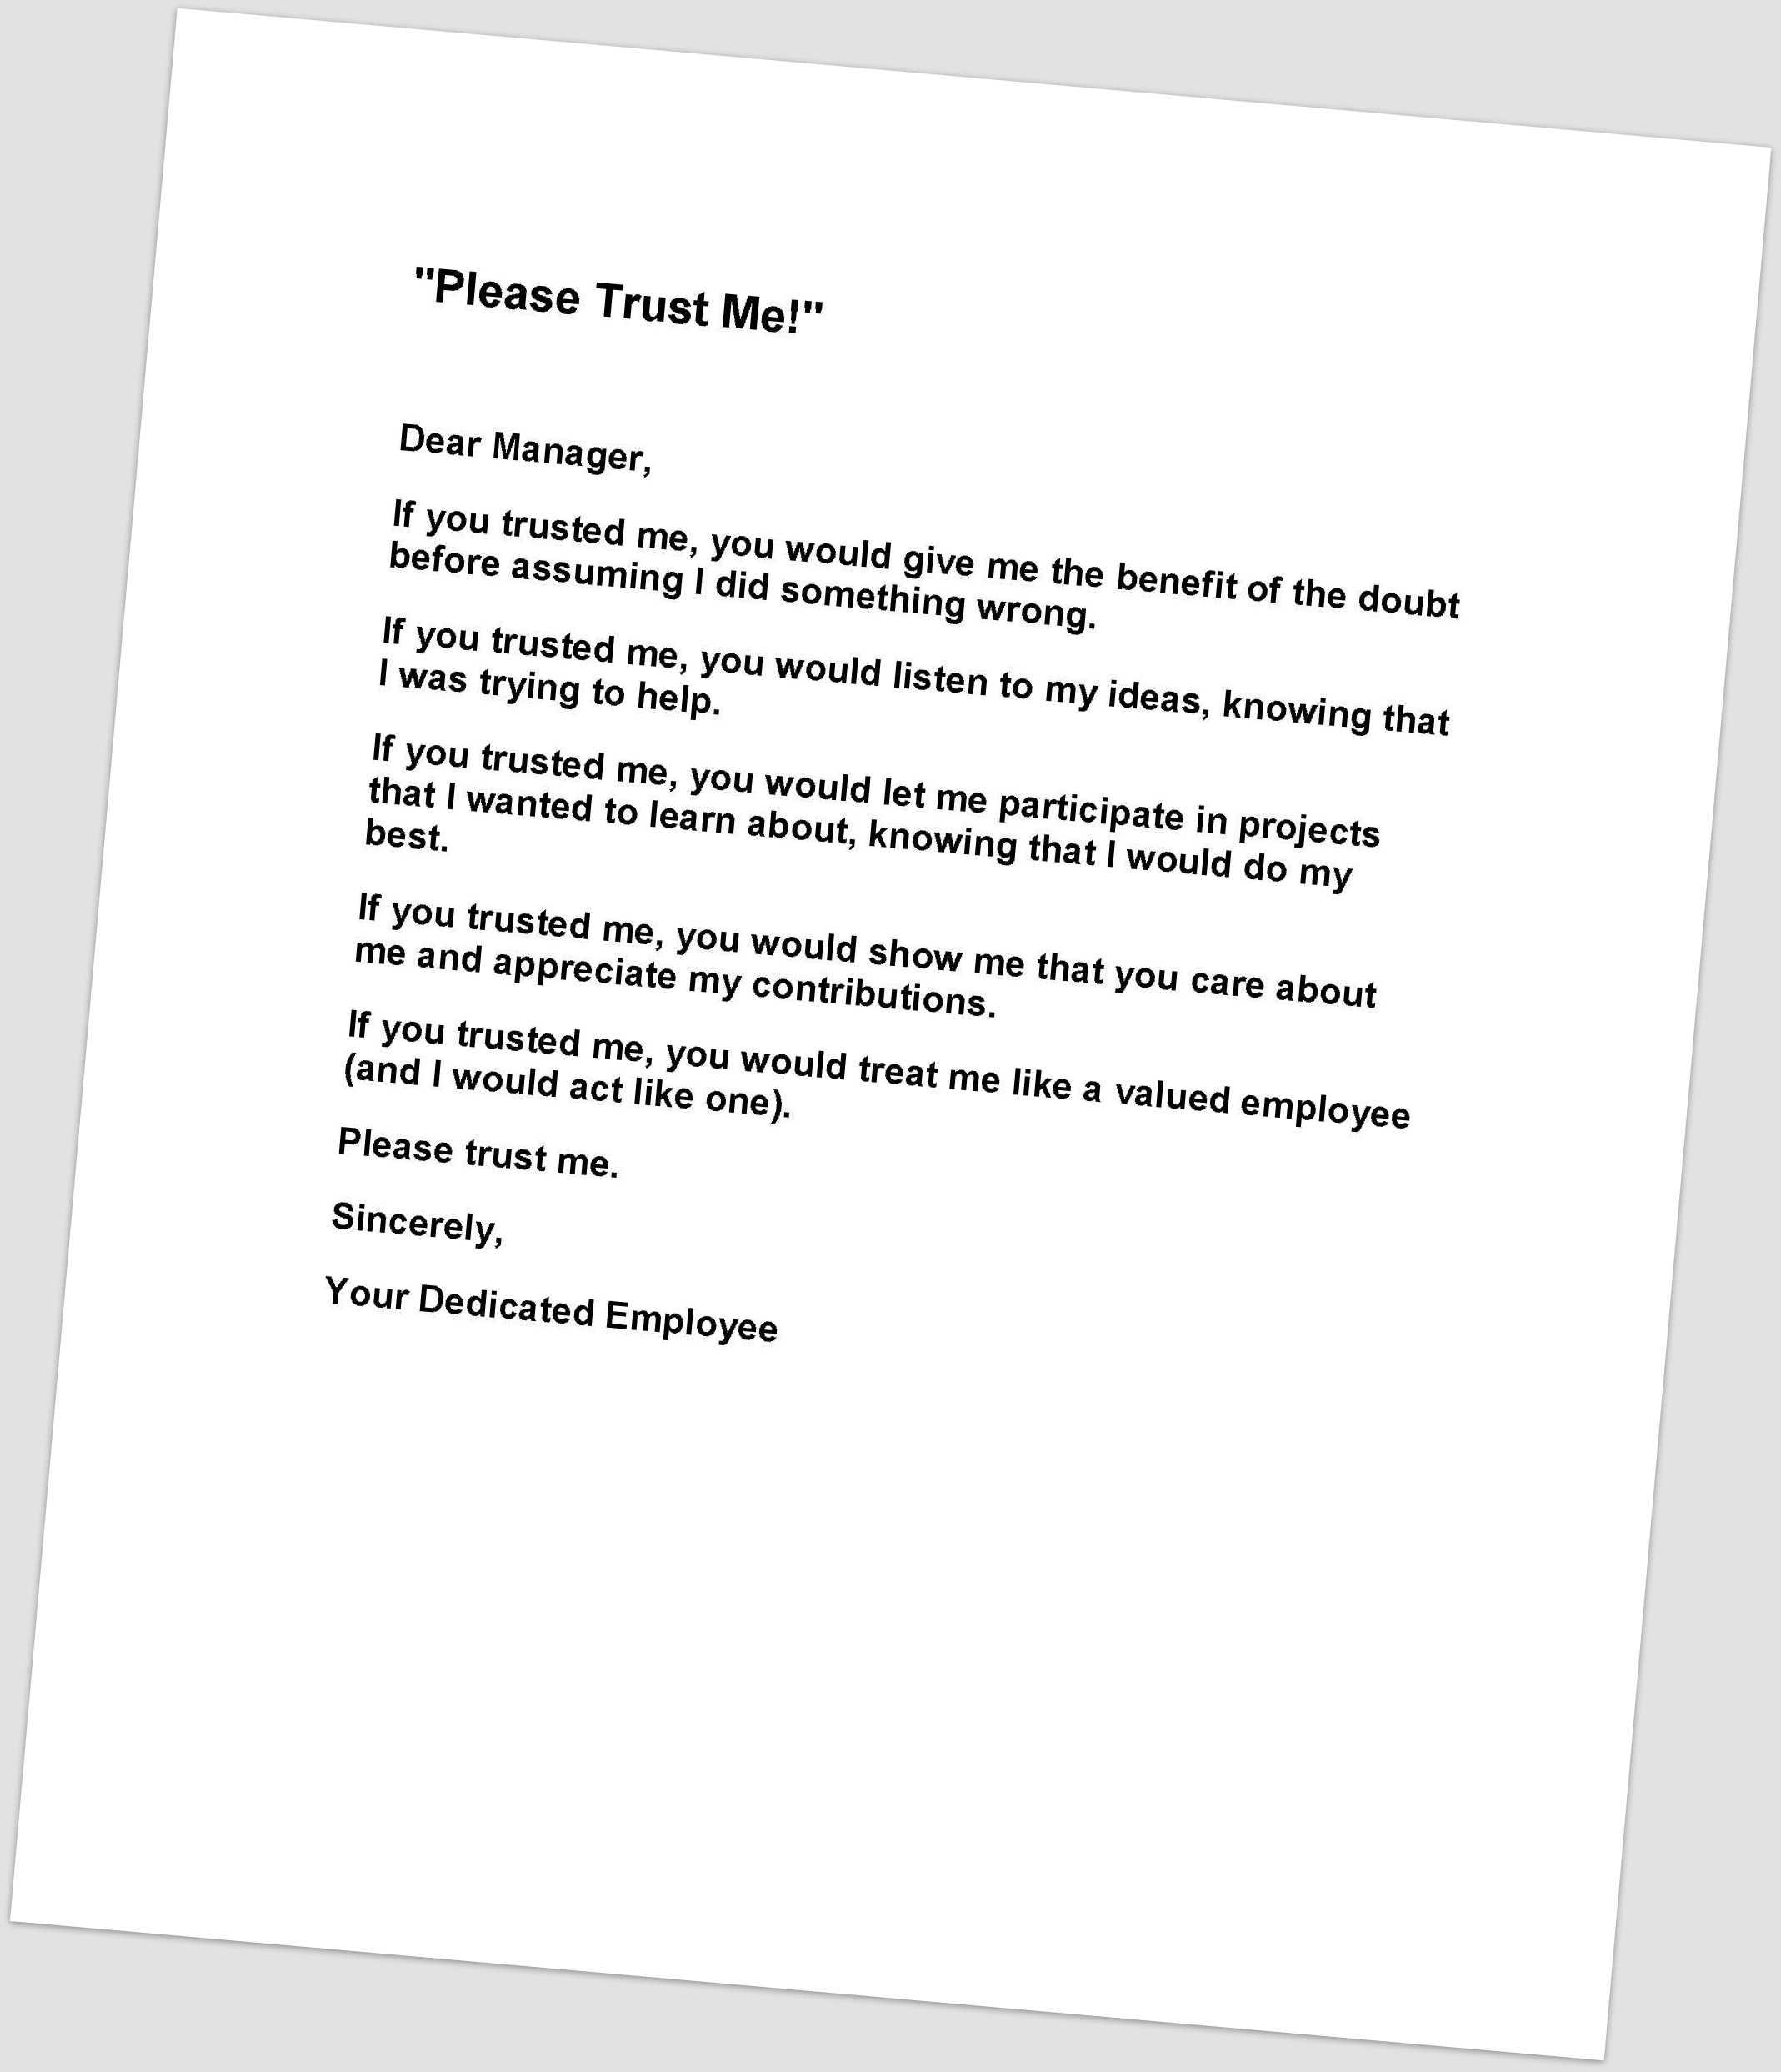 Dear Manager Letter